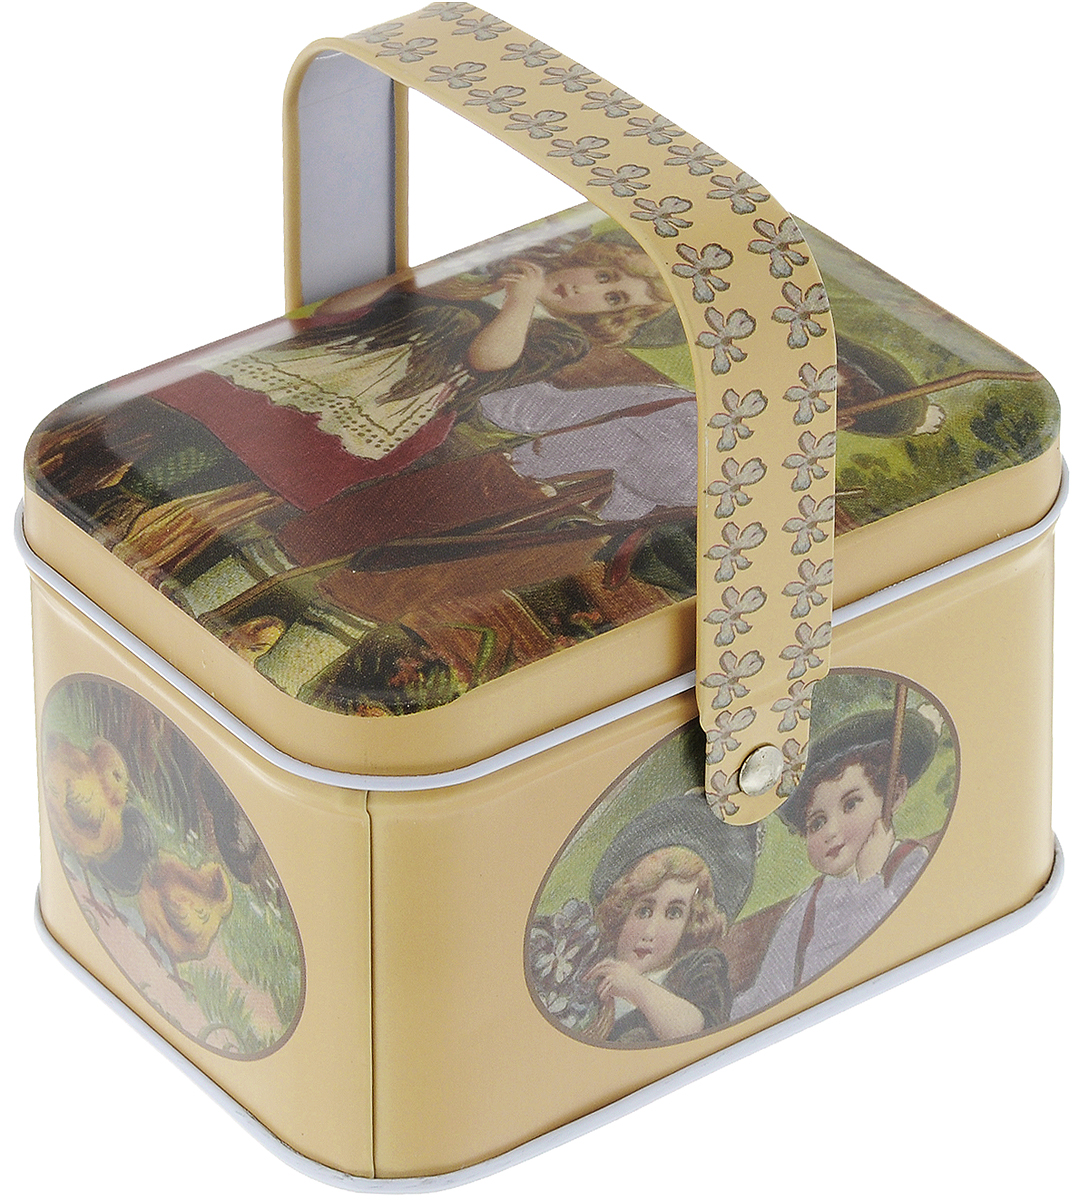 Коробка для хранения мелочей Hobby & Pro, 10,5 х 8 х 6,2 см. 7712762/941001 шкатулка для рукоделия hobby